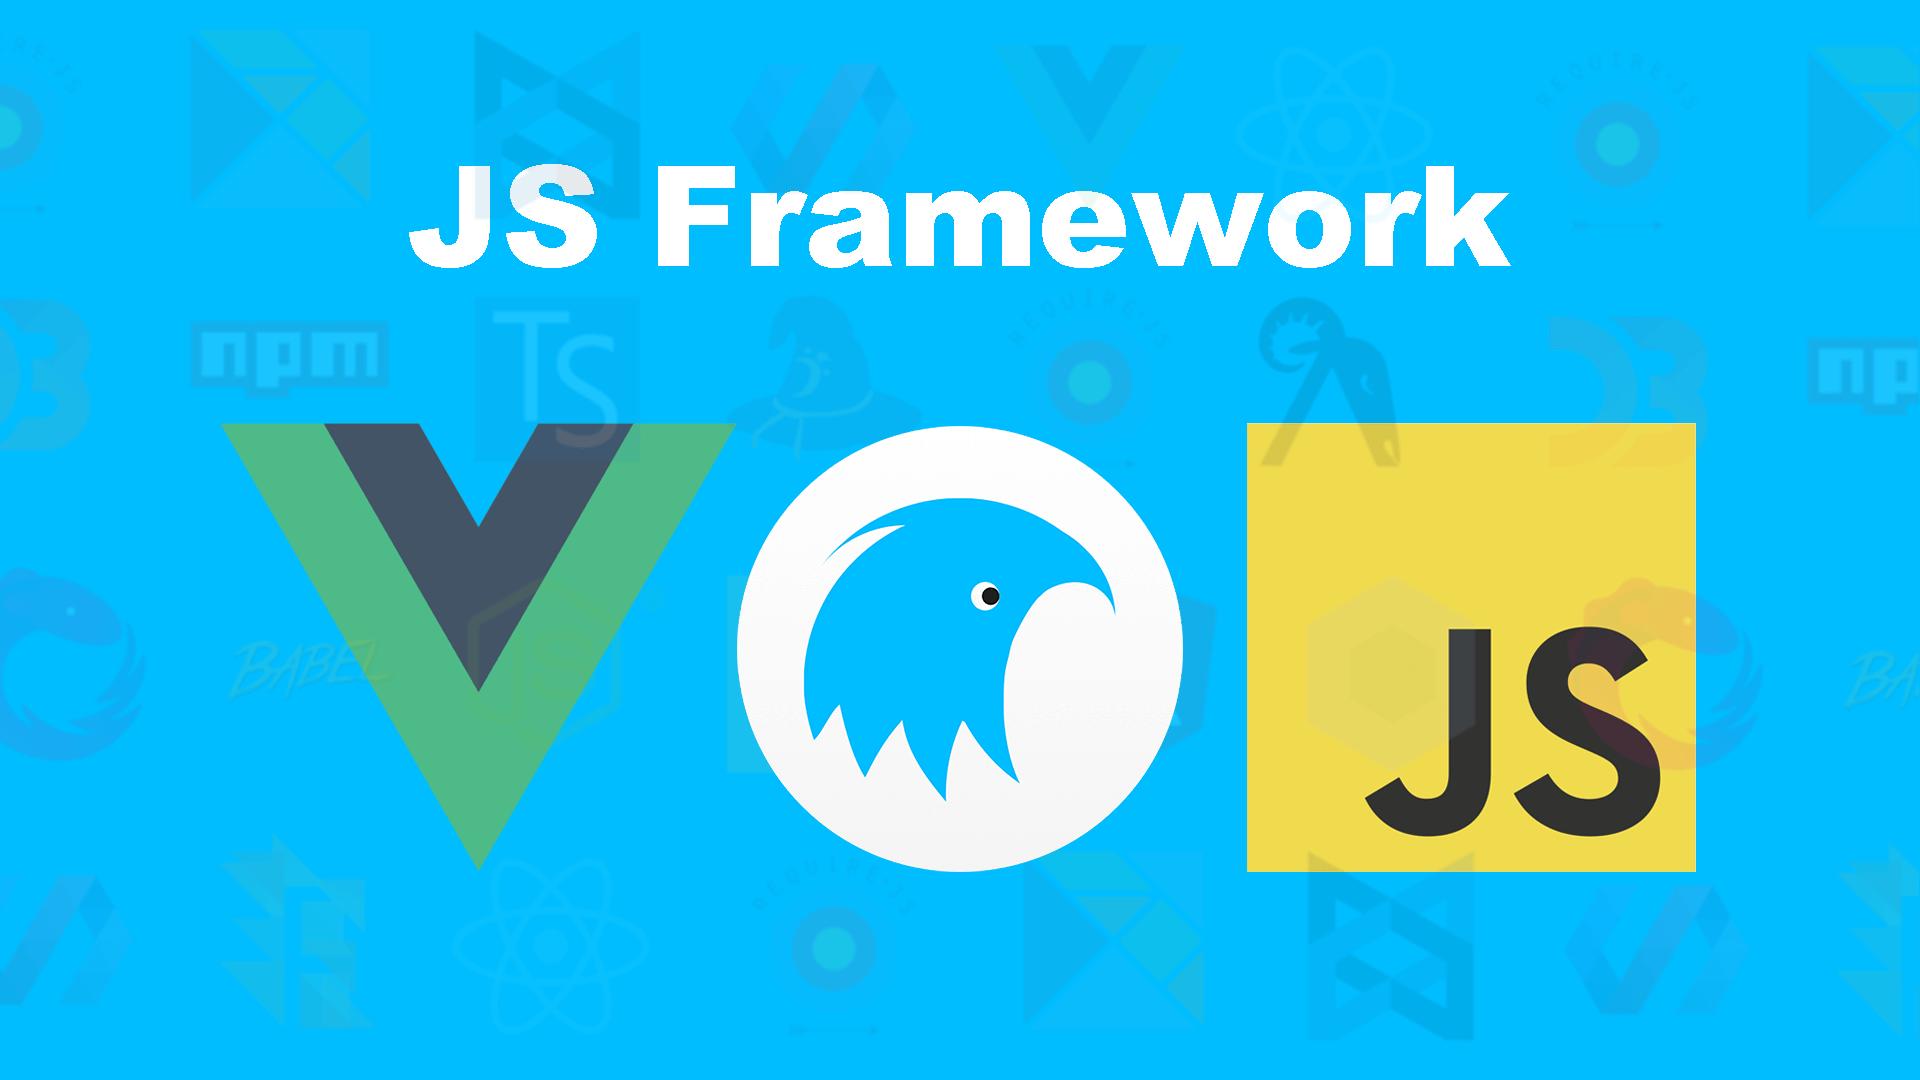 Weex 中别具匠心的 JS Framework